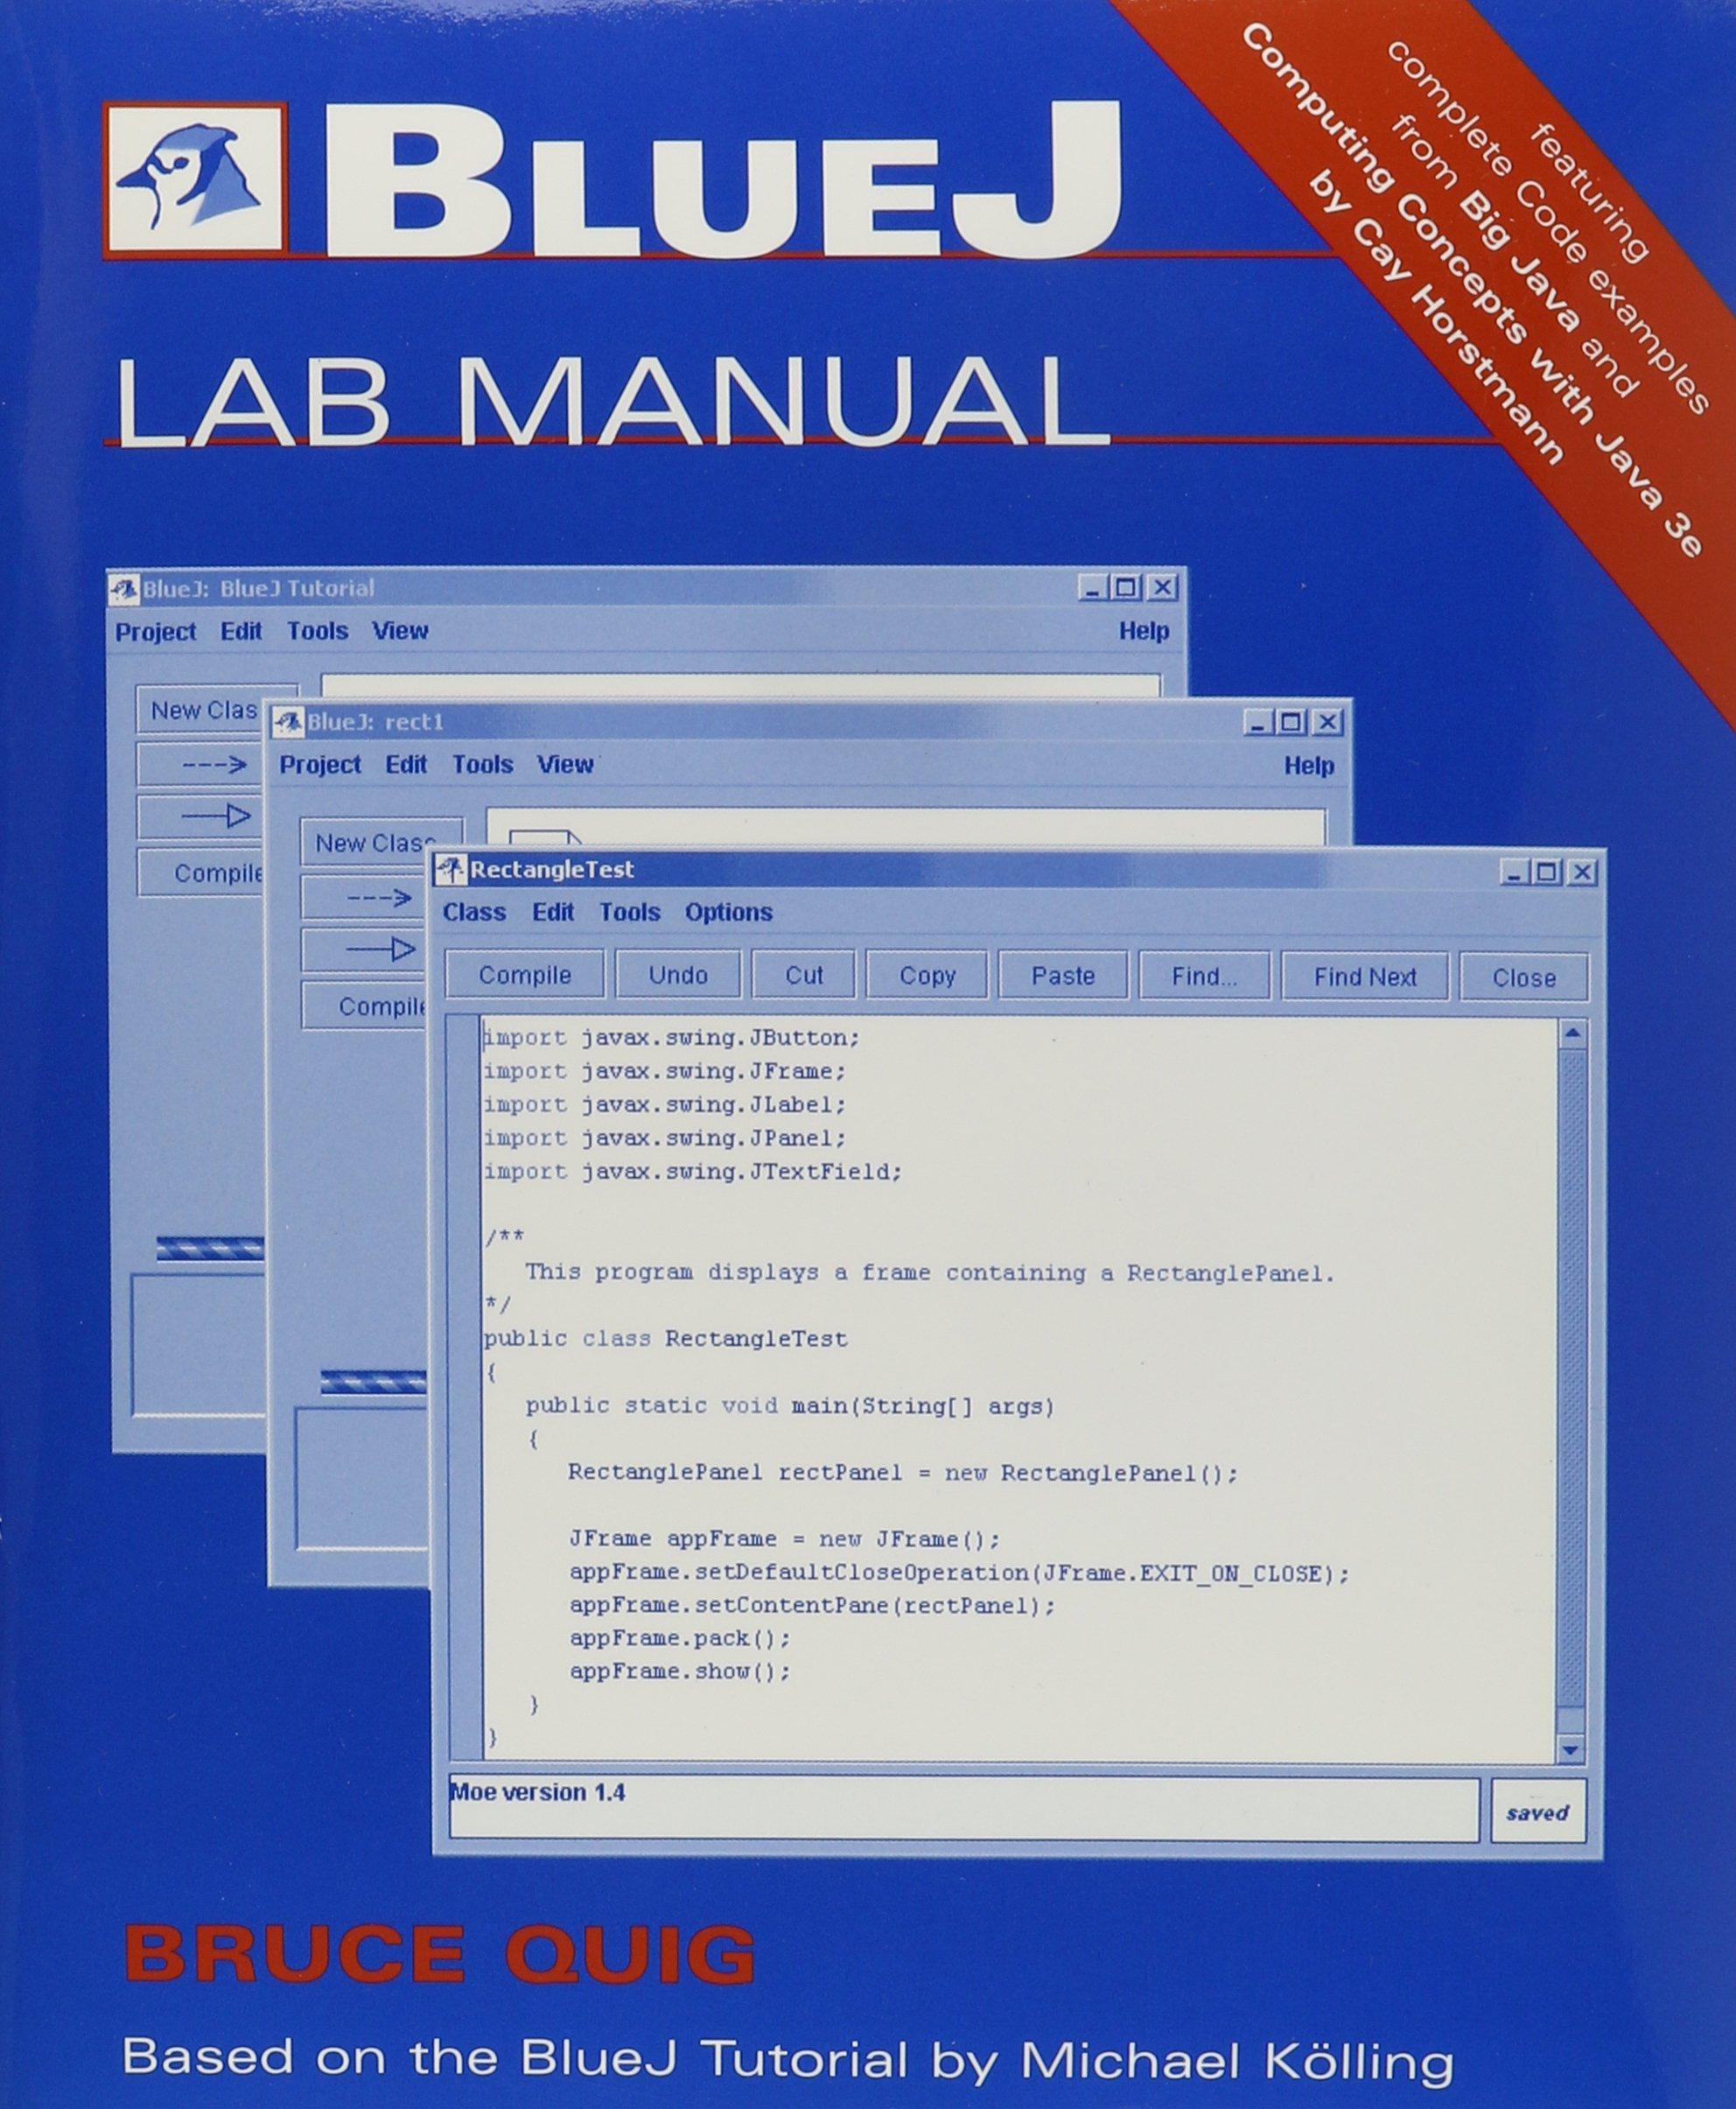 Java bluej tutorial image collections any tutorial examples bluej java tutorial image collections any tutorial examples buy big java with bluej lab manual set baditri Images